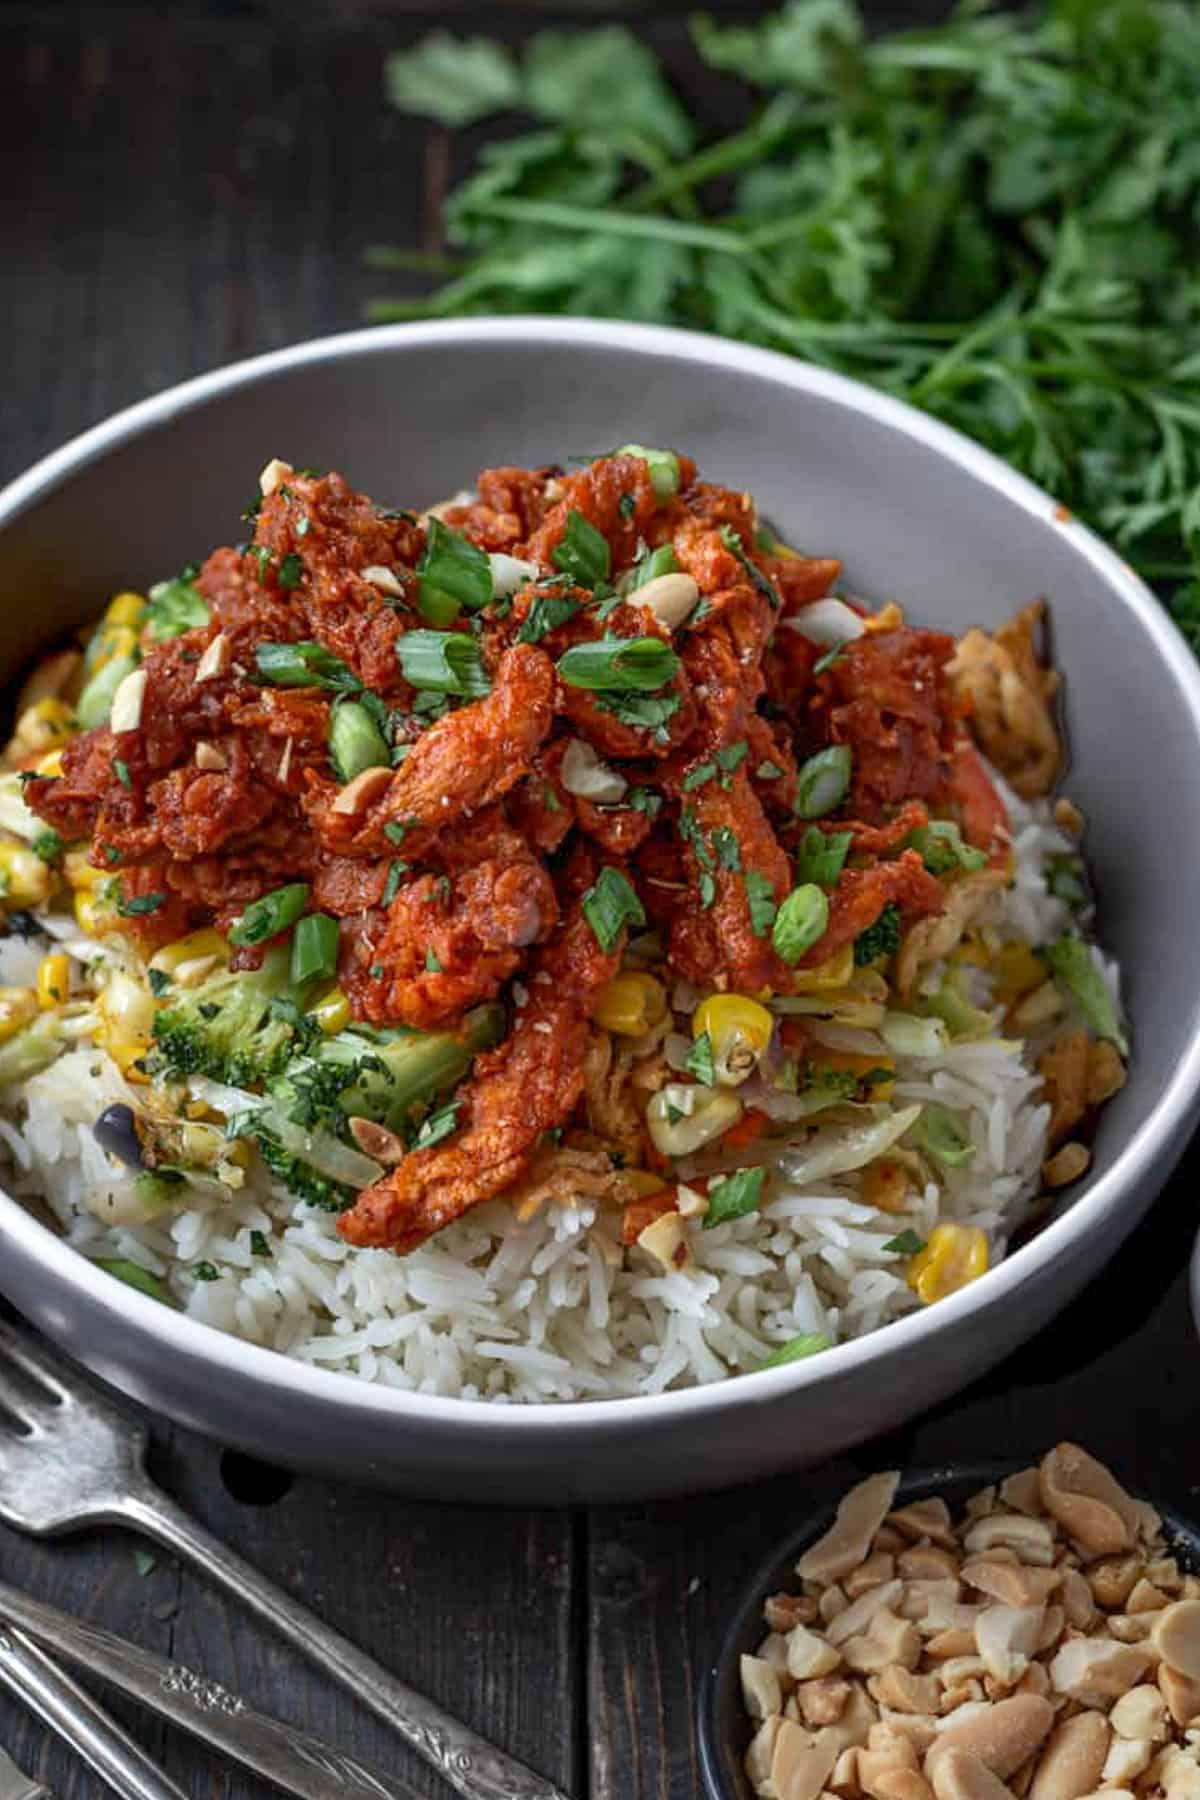 Vegan ginger chicken and stir fry vegetables on rice.